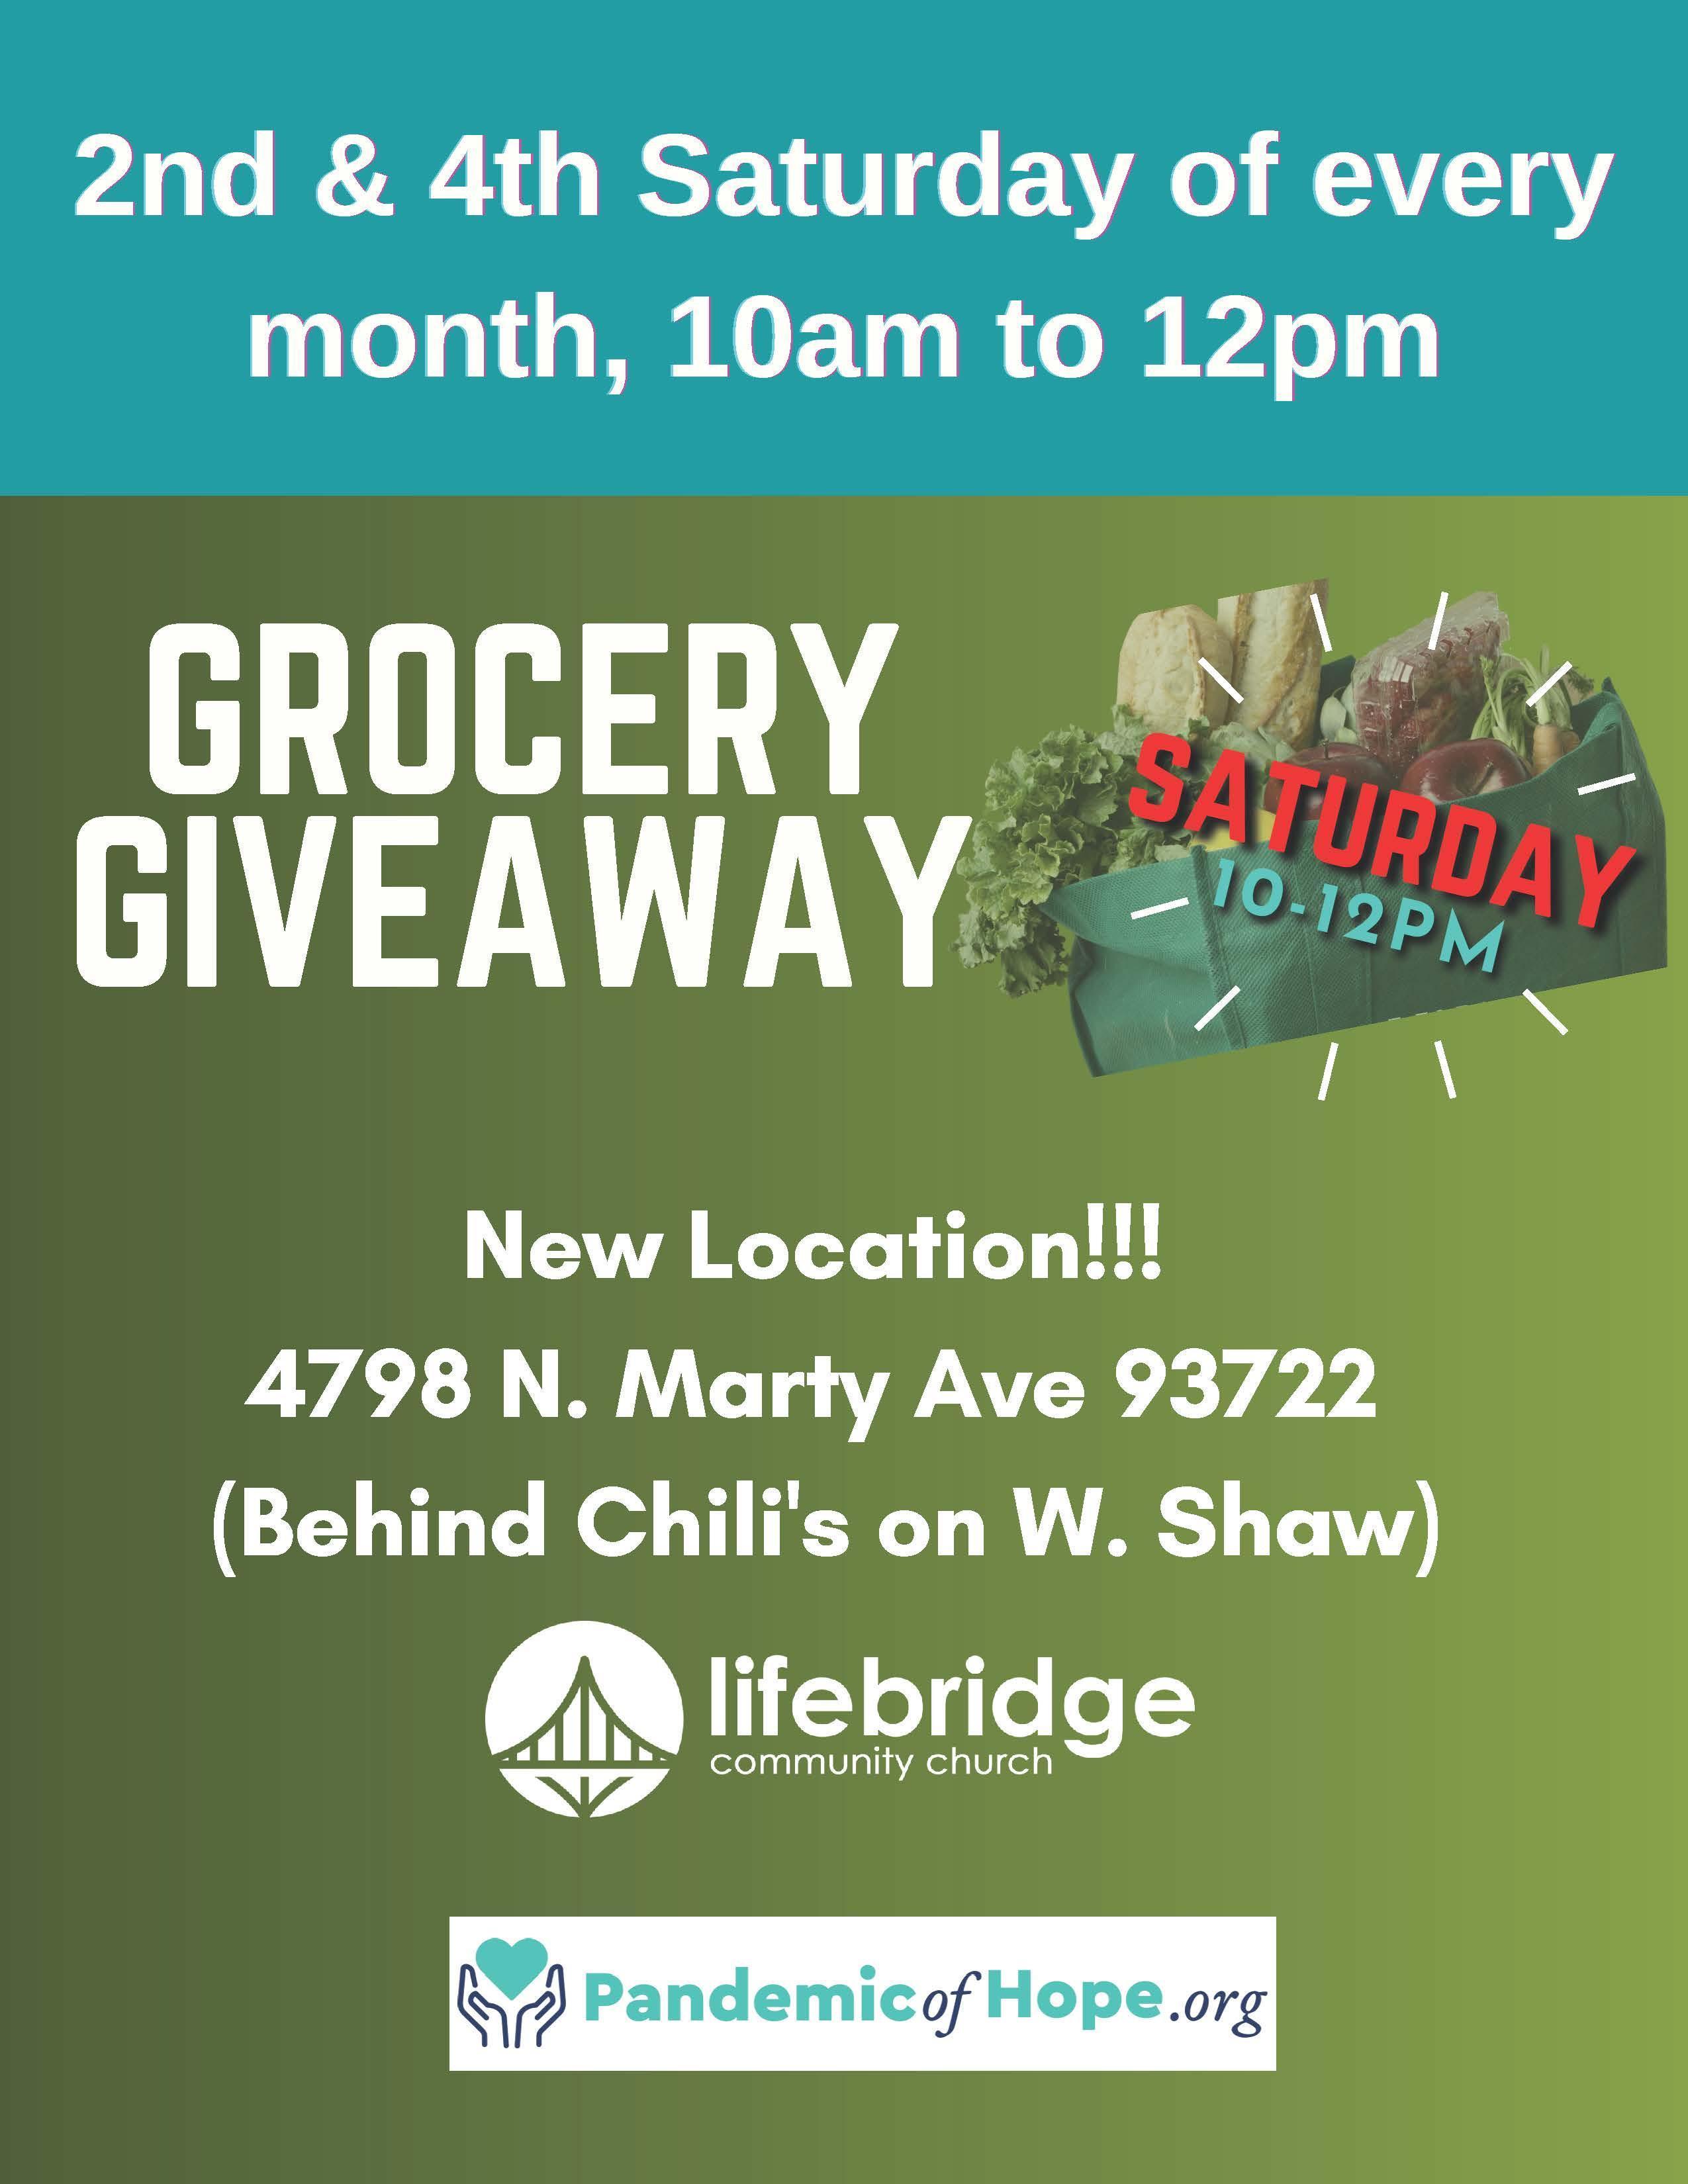 Life bridge Church Grocery Giveaway